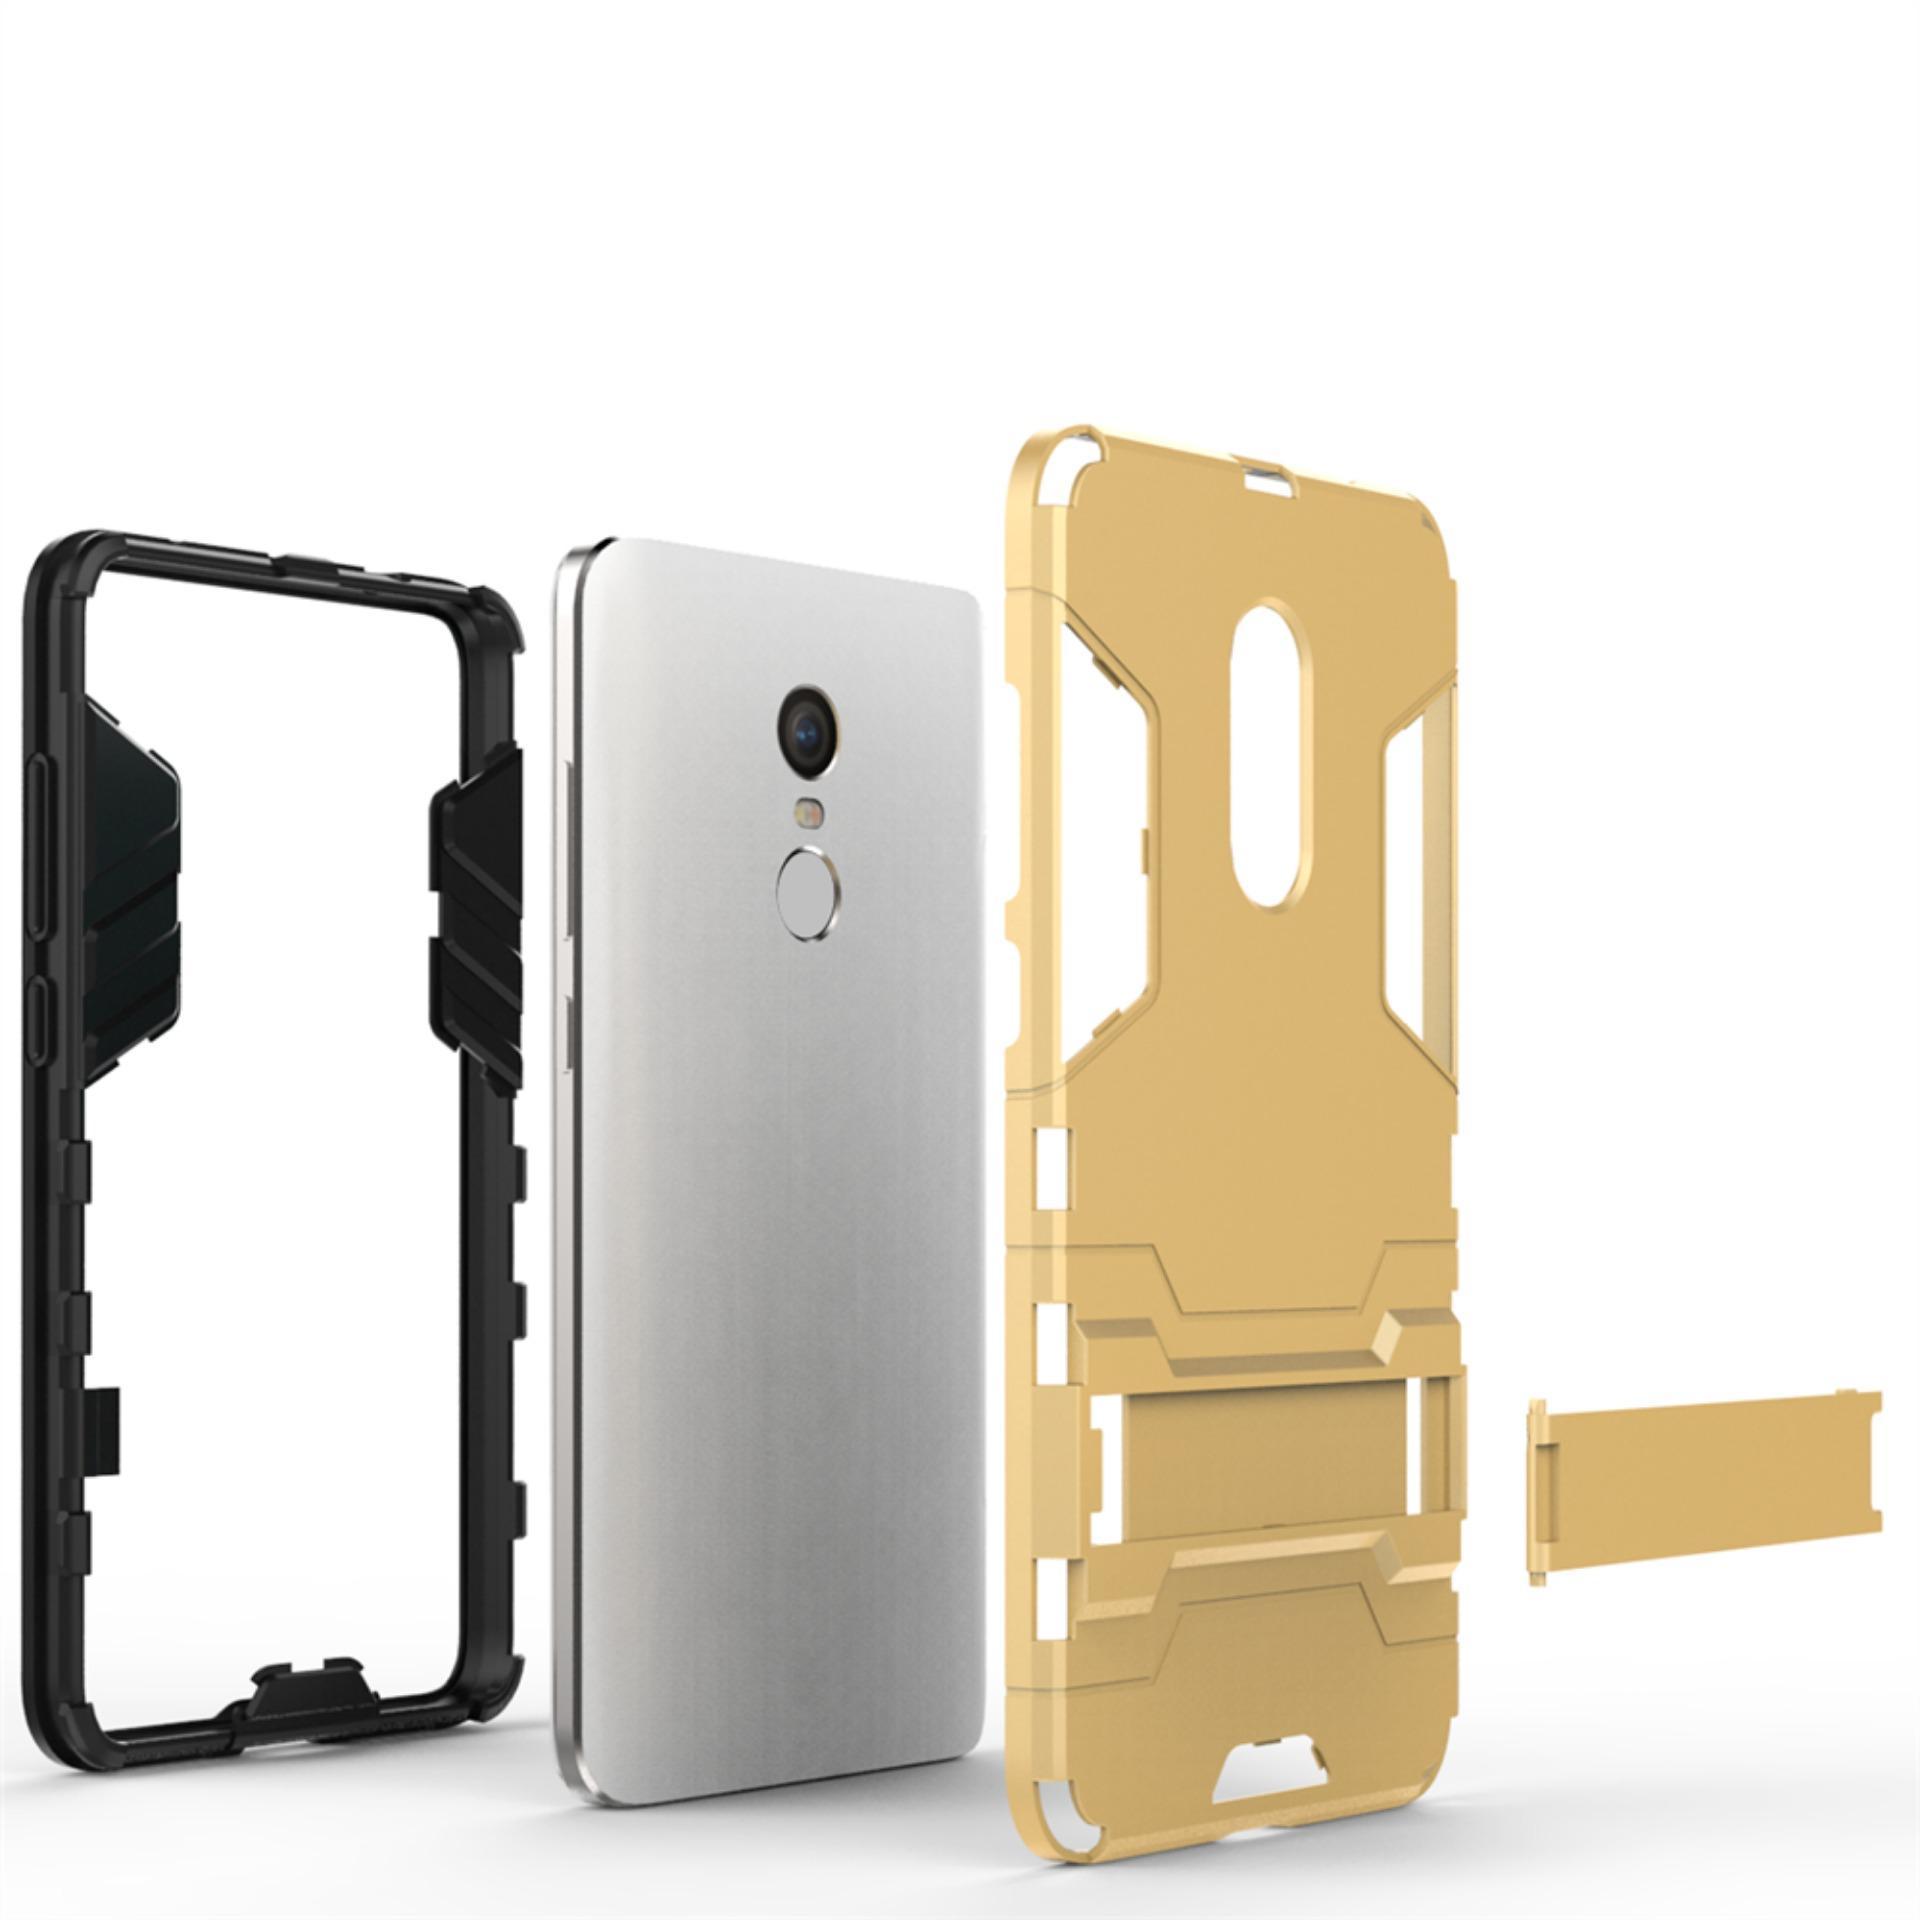 Fitur Cuci Gudang Back Case Xiaomi Redmi Pro 5 Inch Iron Man Kick Transformers Standing Vivo V5 Biru 55 Stand